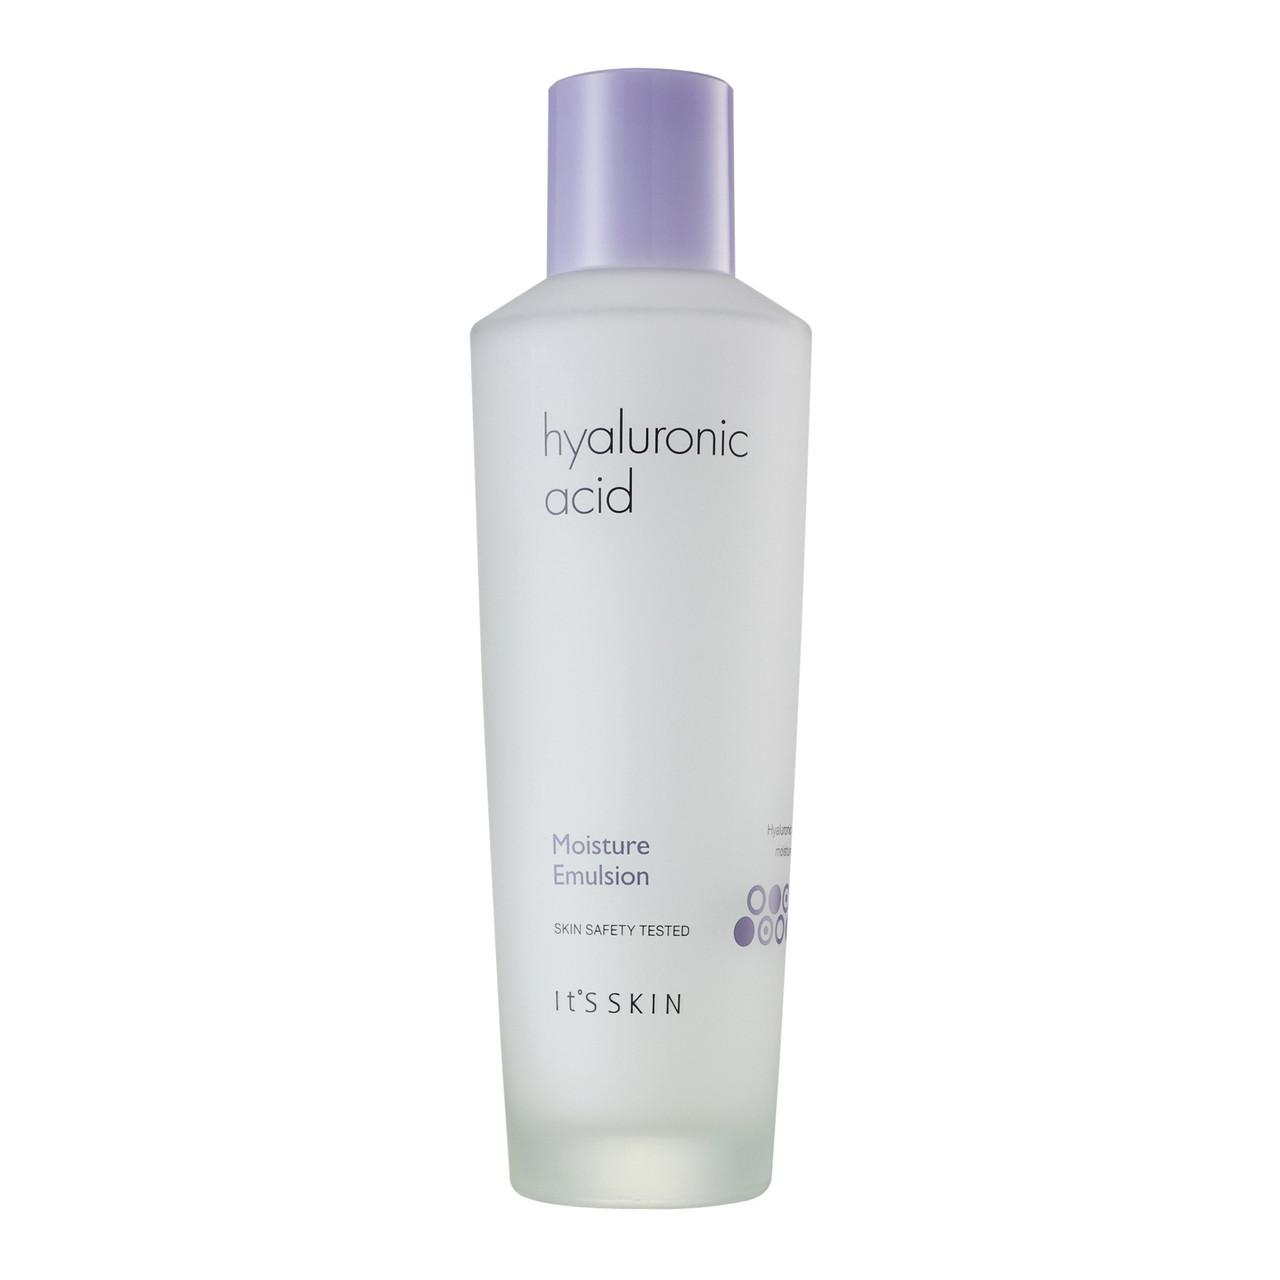 Увлажняющий тонер с гиалуроновой кислотой It's Skin Hyaluronic Acid Moisture Toner